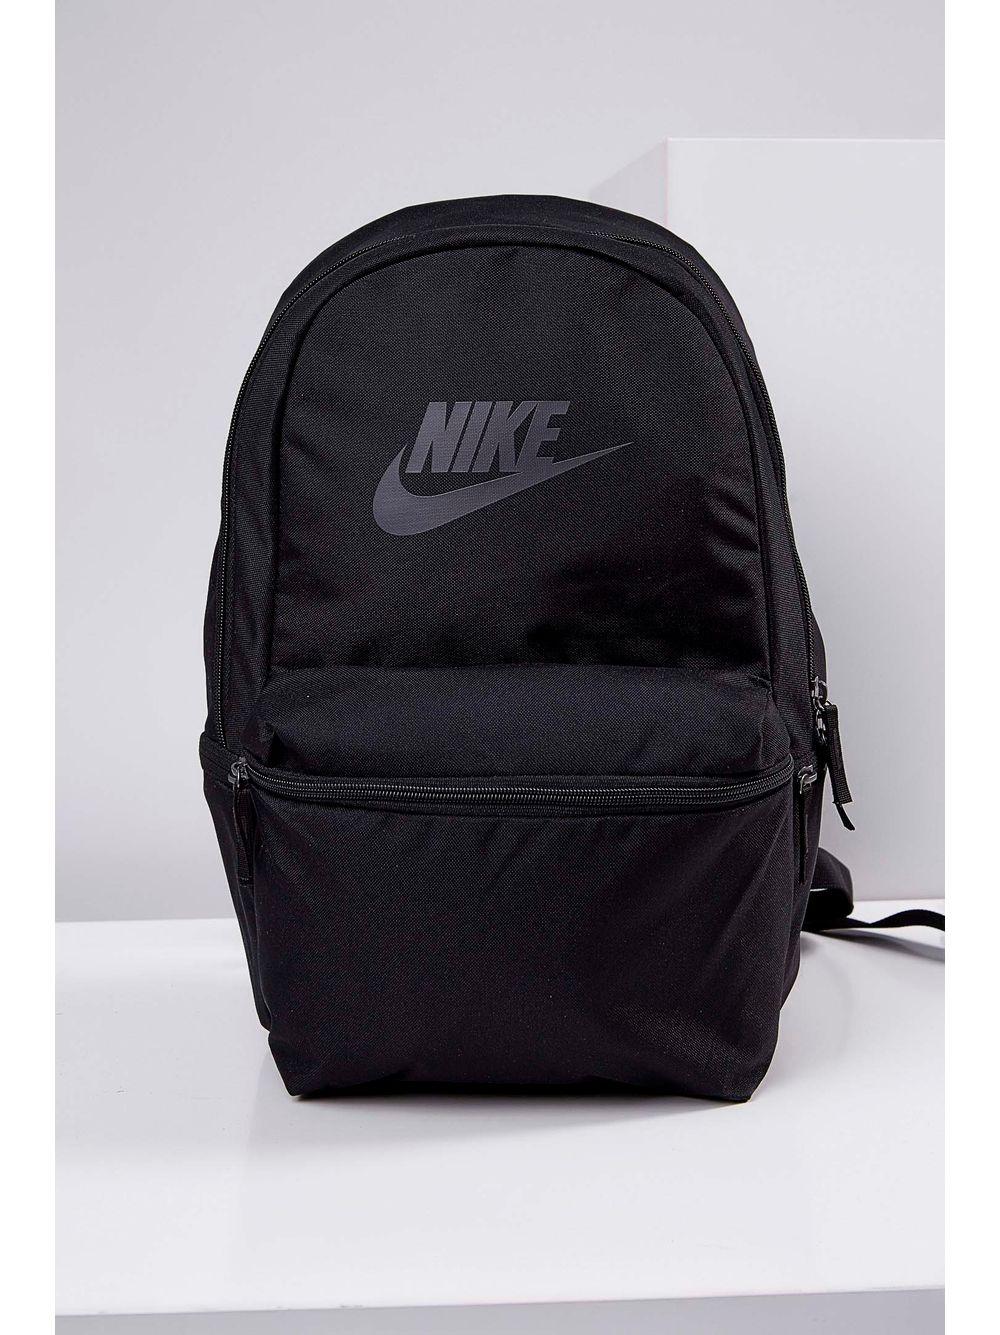 04f99f2ff Mochila Nike Ba5749-010 Heritage Preto - pittol